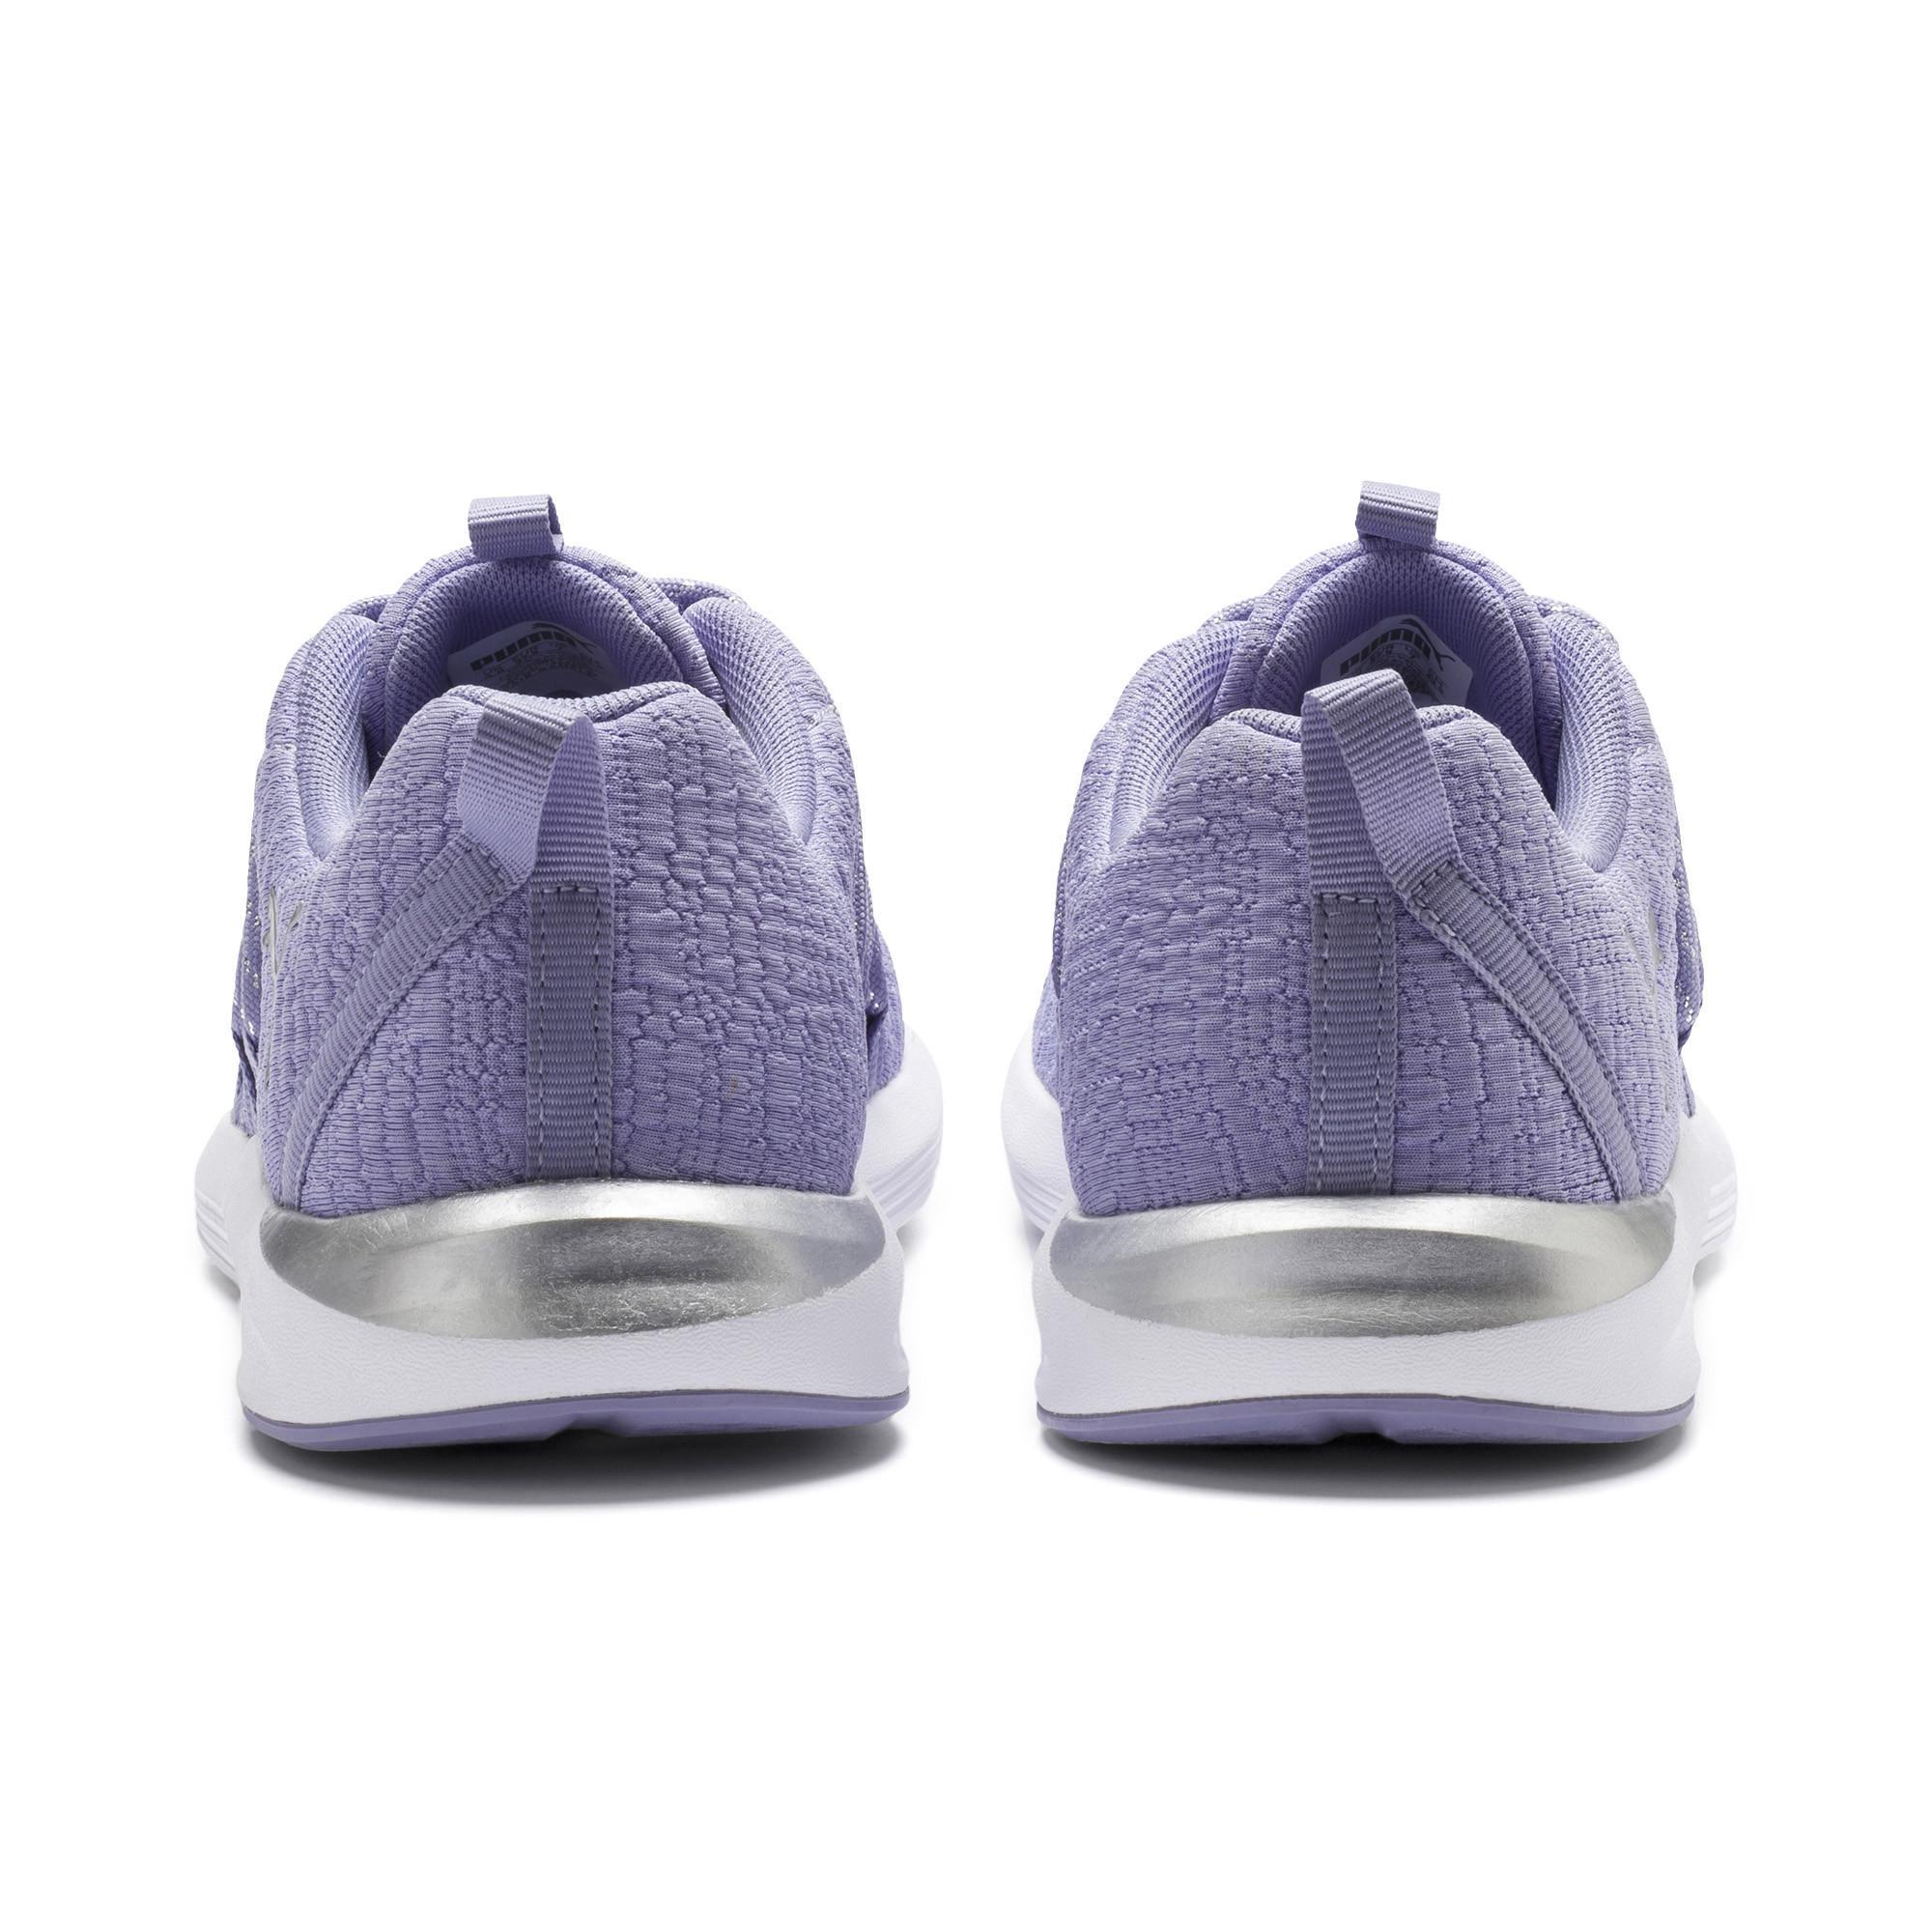 ... Prowl Alt Metallic Training Shoes - Lyst. View fullscreen d140e4780